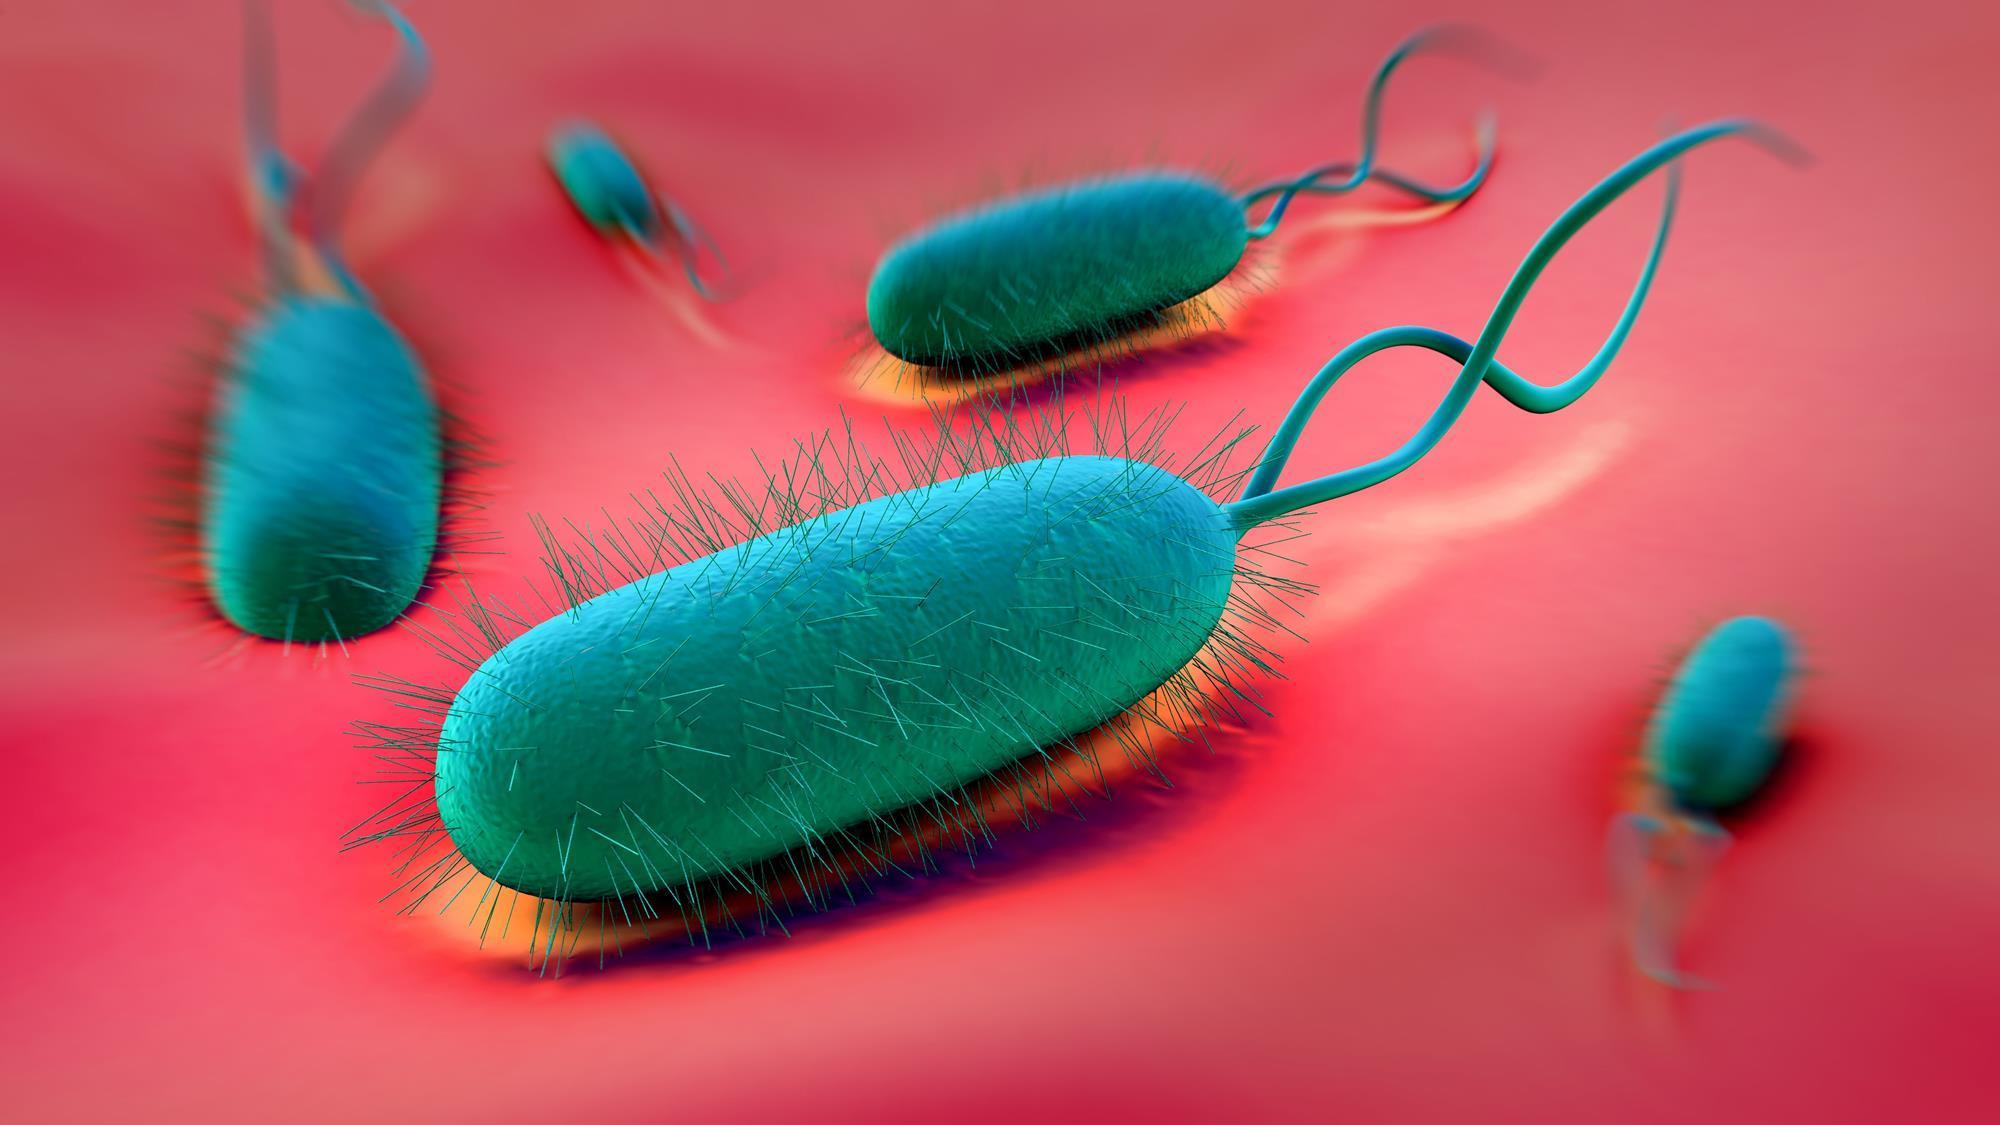 Bismuth drugs kill bacteria by disrupting metabolism